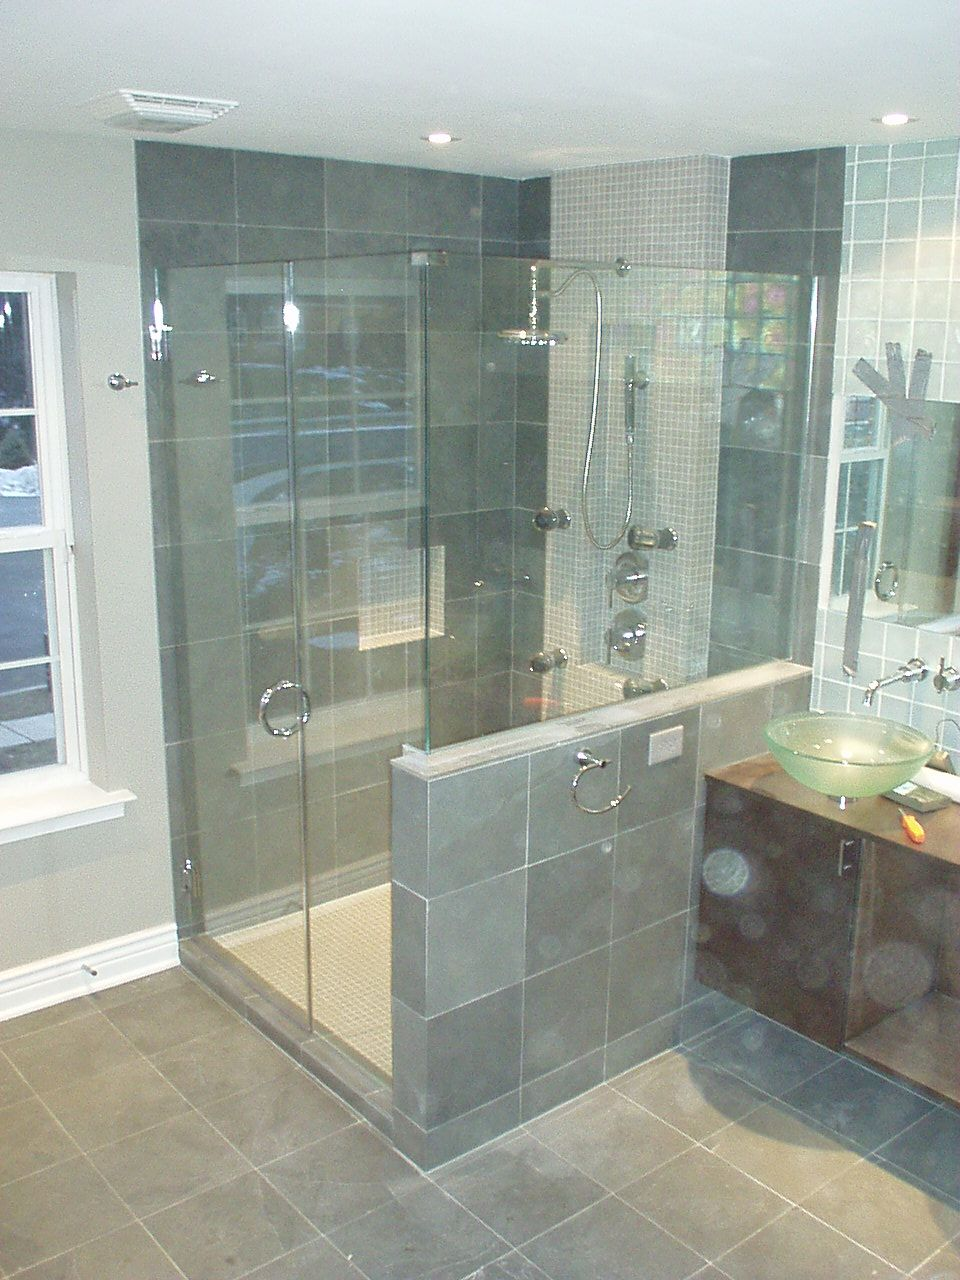 Bathroom OLYMPUS DIGITAL CAMERA Frameless Shower Doors Complete ...